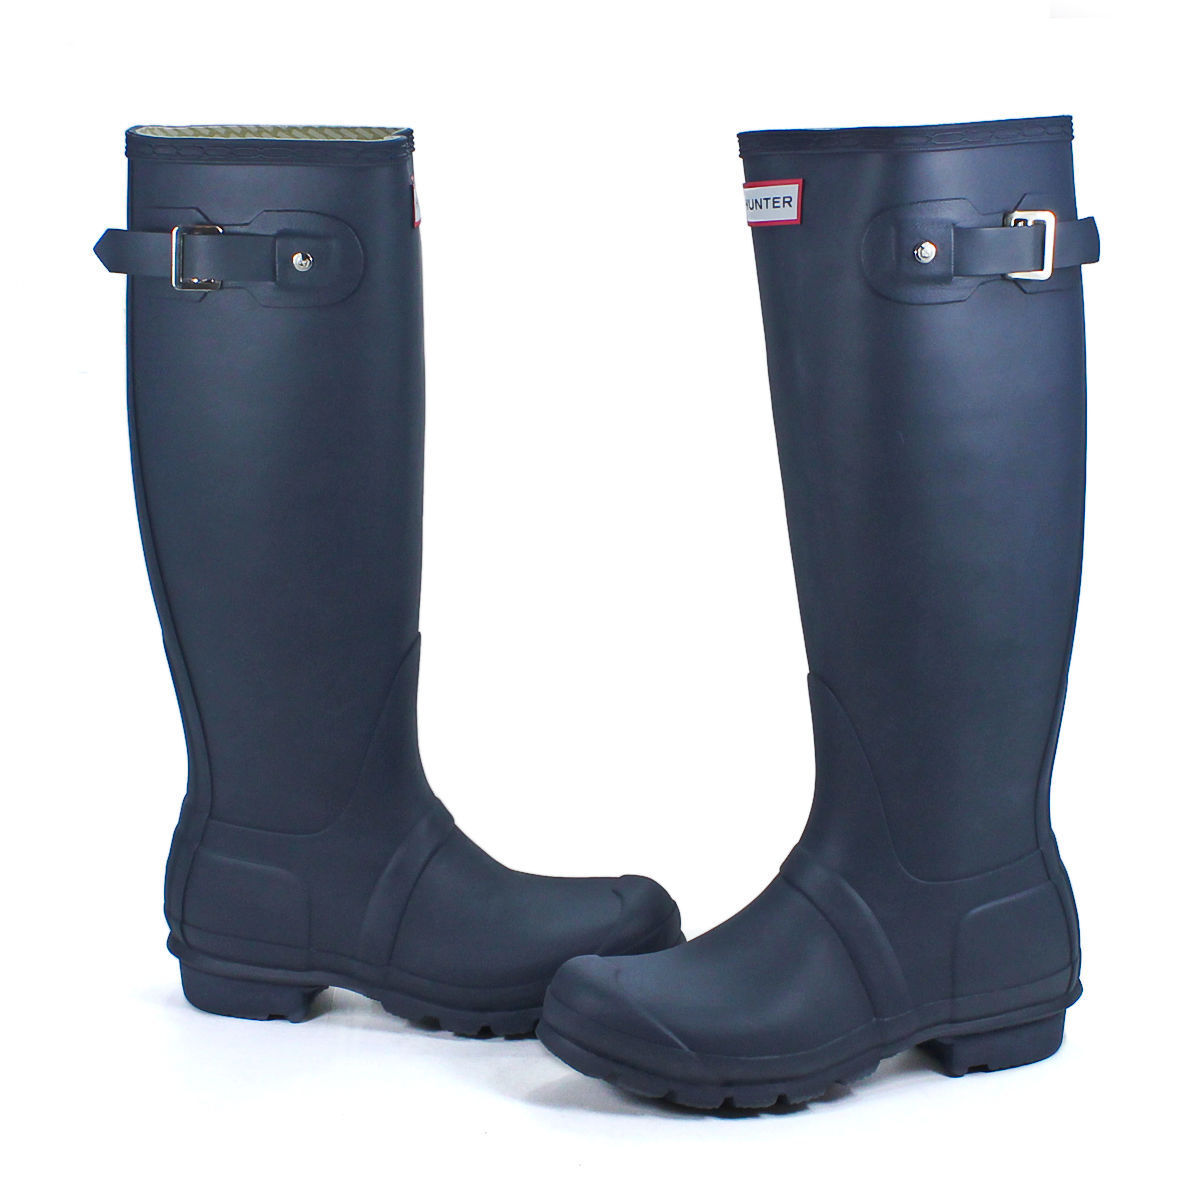 Hunter Original Tall Wellington Wmn's Boots WFT1000RMA Welly Navy SZ:5-11 *NIB*